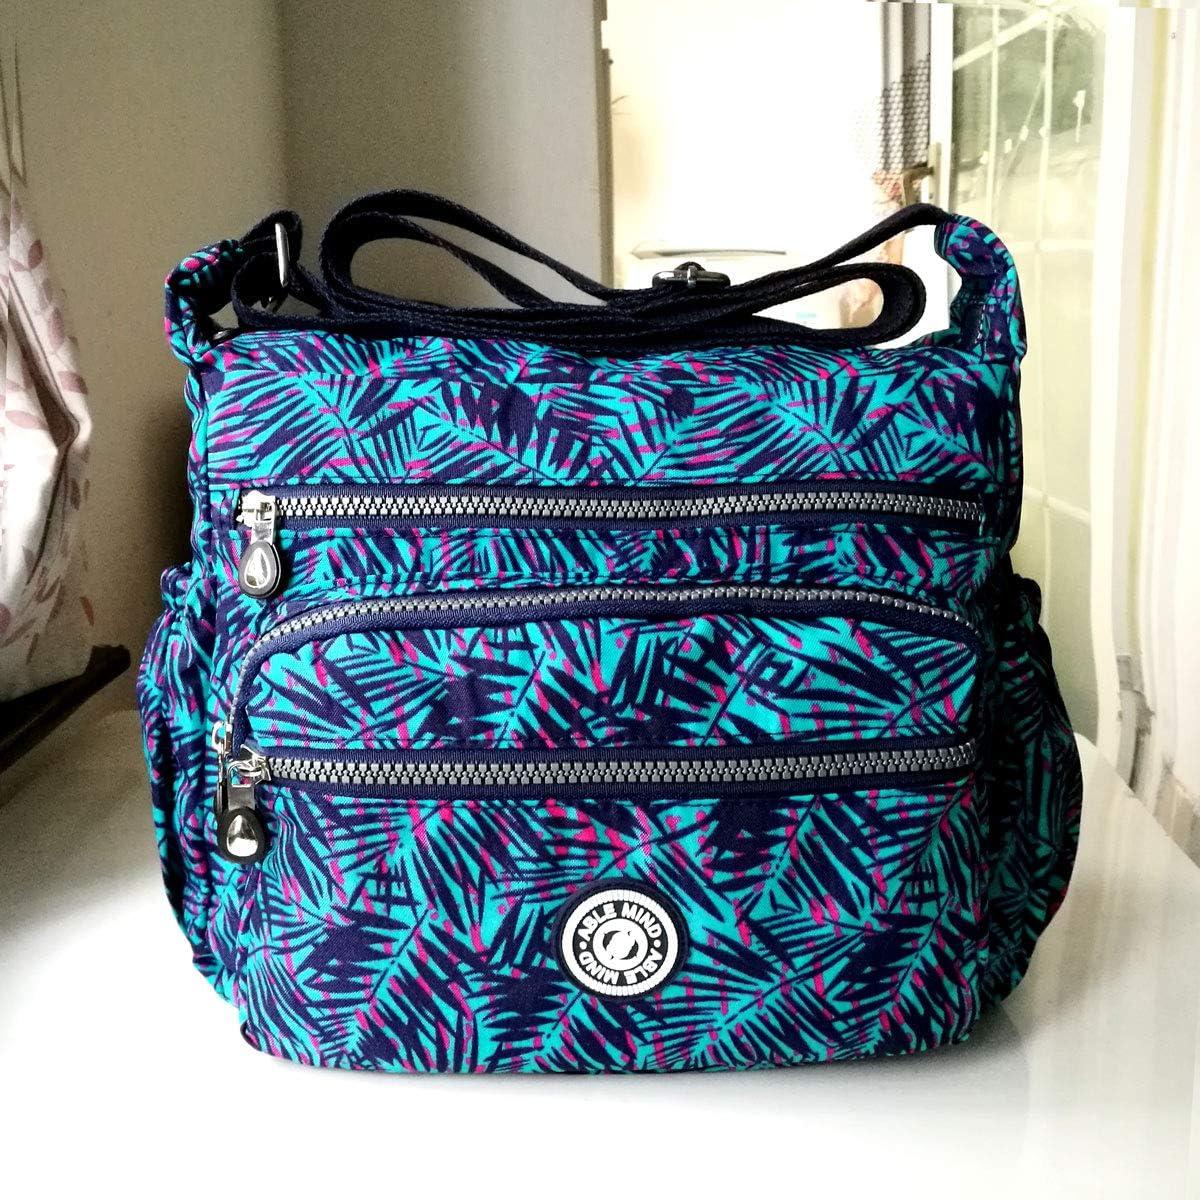 AIBILIEI Women Larger Bag Nylon Crossbody Bag Messenger Shoulder Handbag for Shopping Work Daily Use